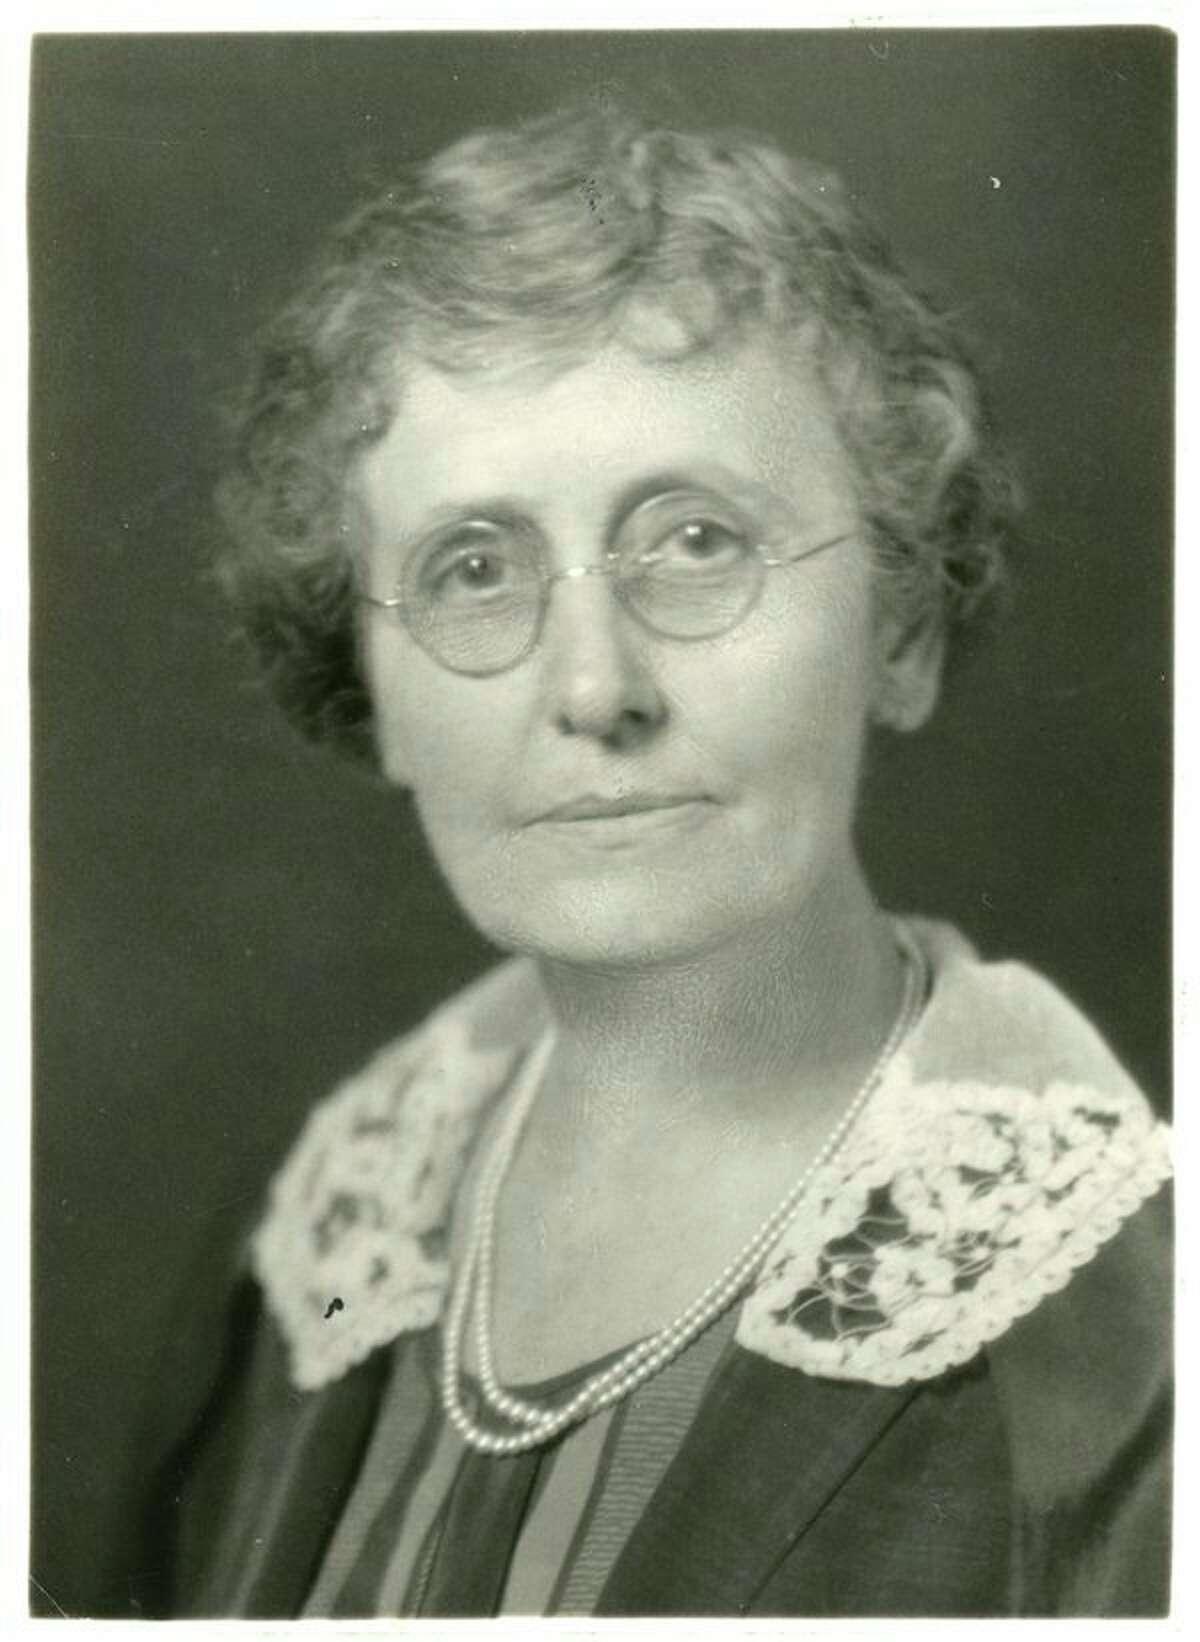 Louanna Baker (MCHS archive photo)